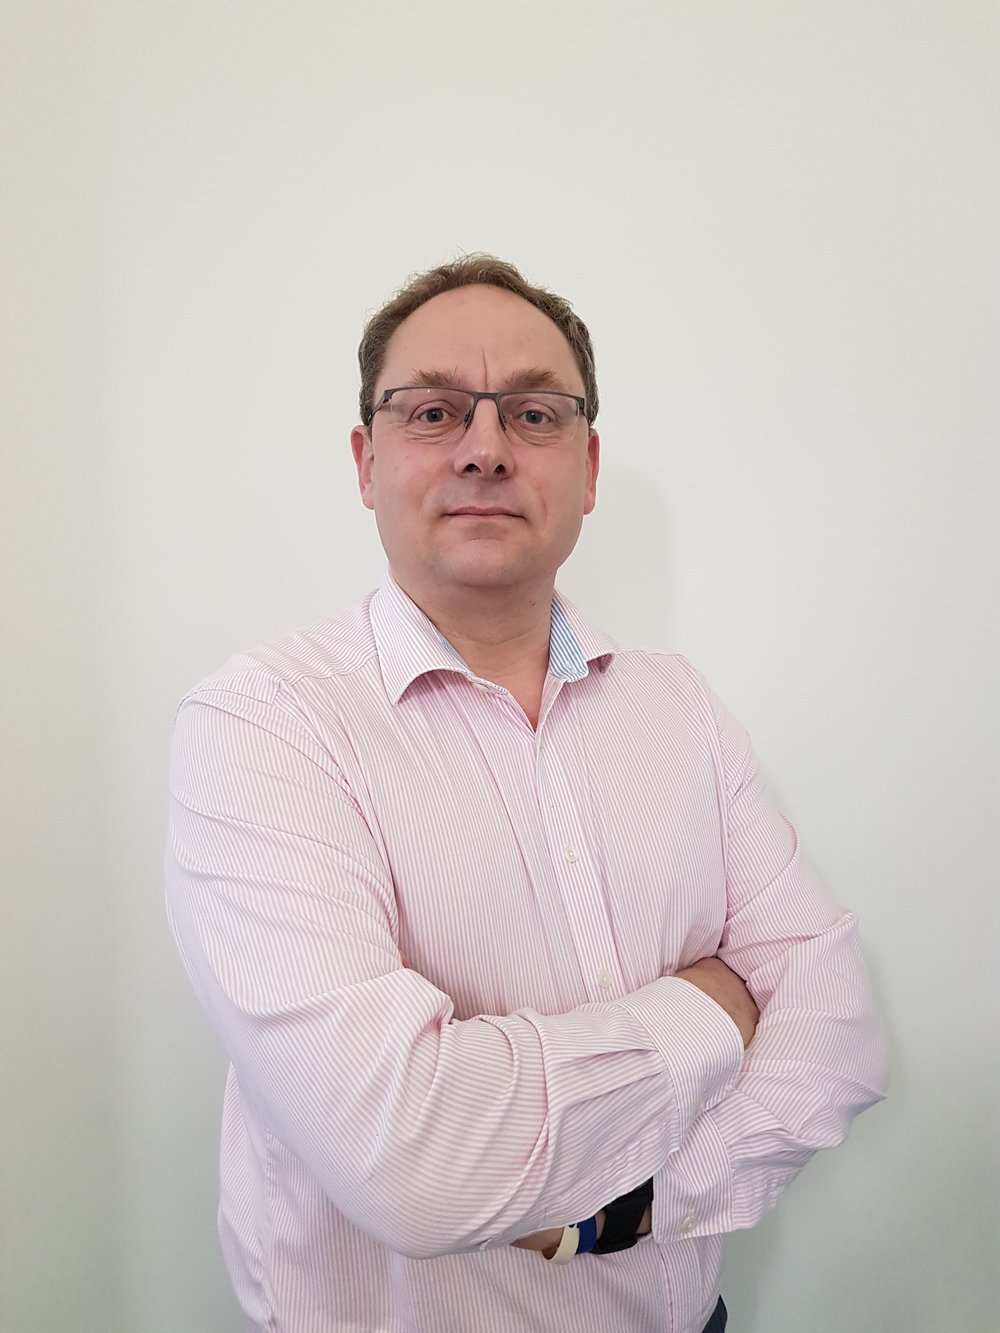 Mr Alastair Parkinson - AAB Member